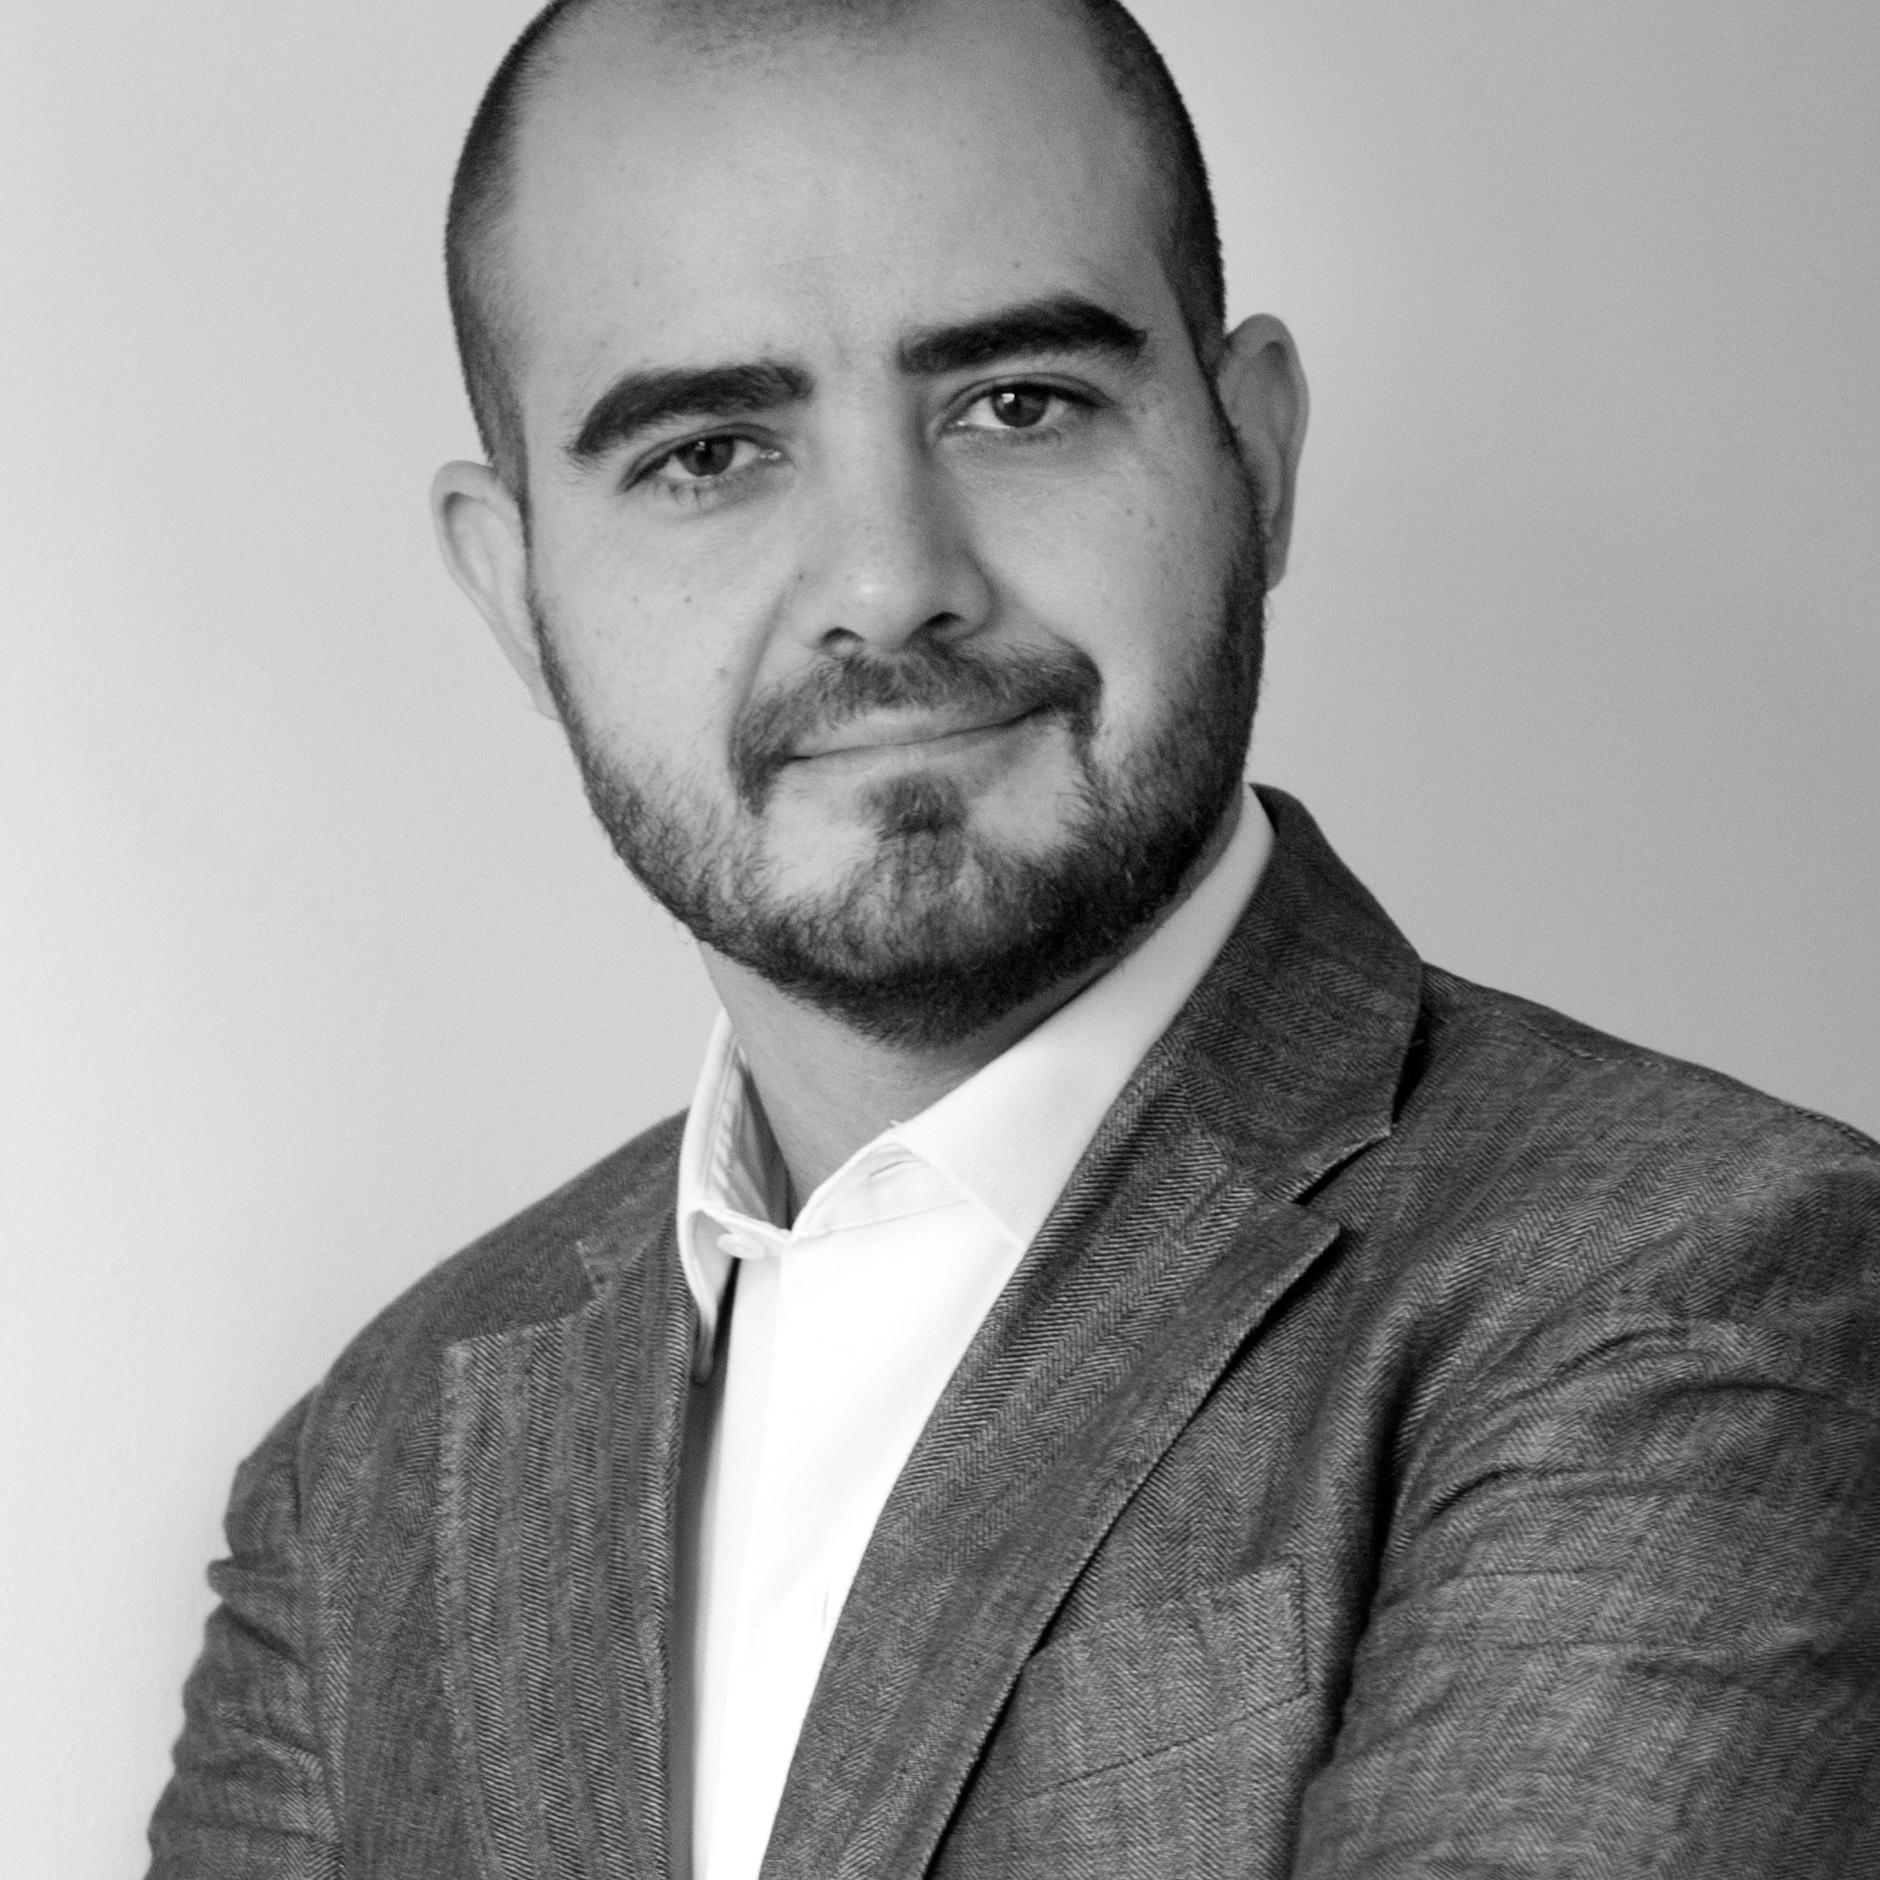 Juan Antonio Muñoz-Gallego